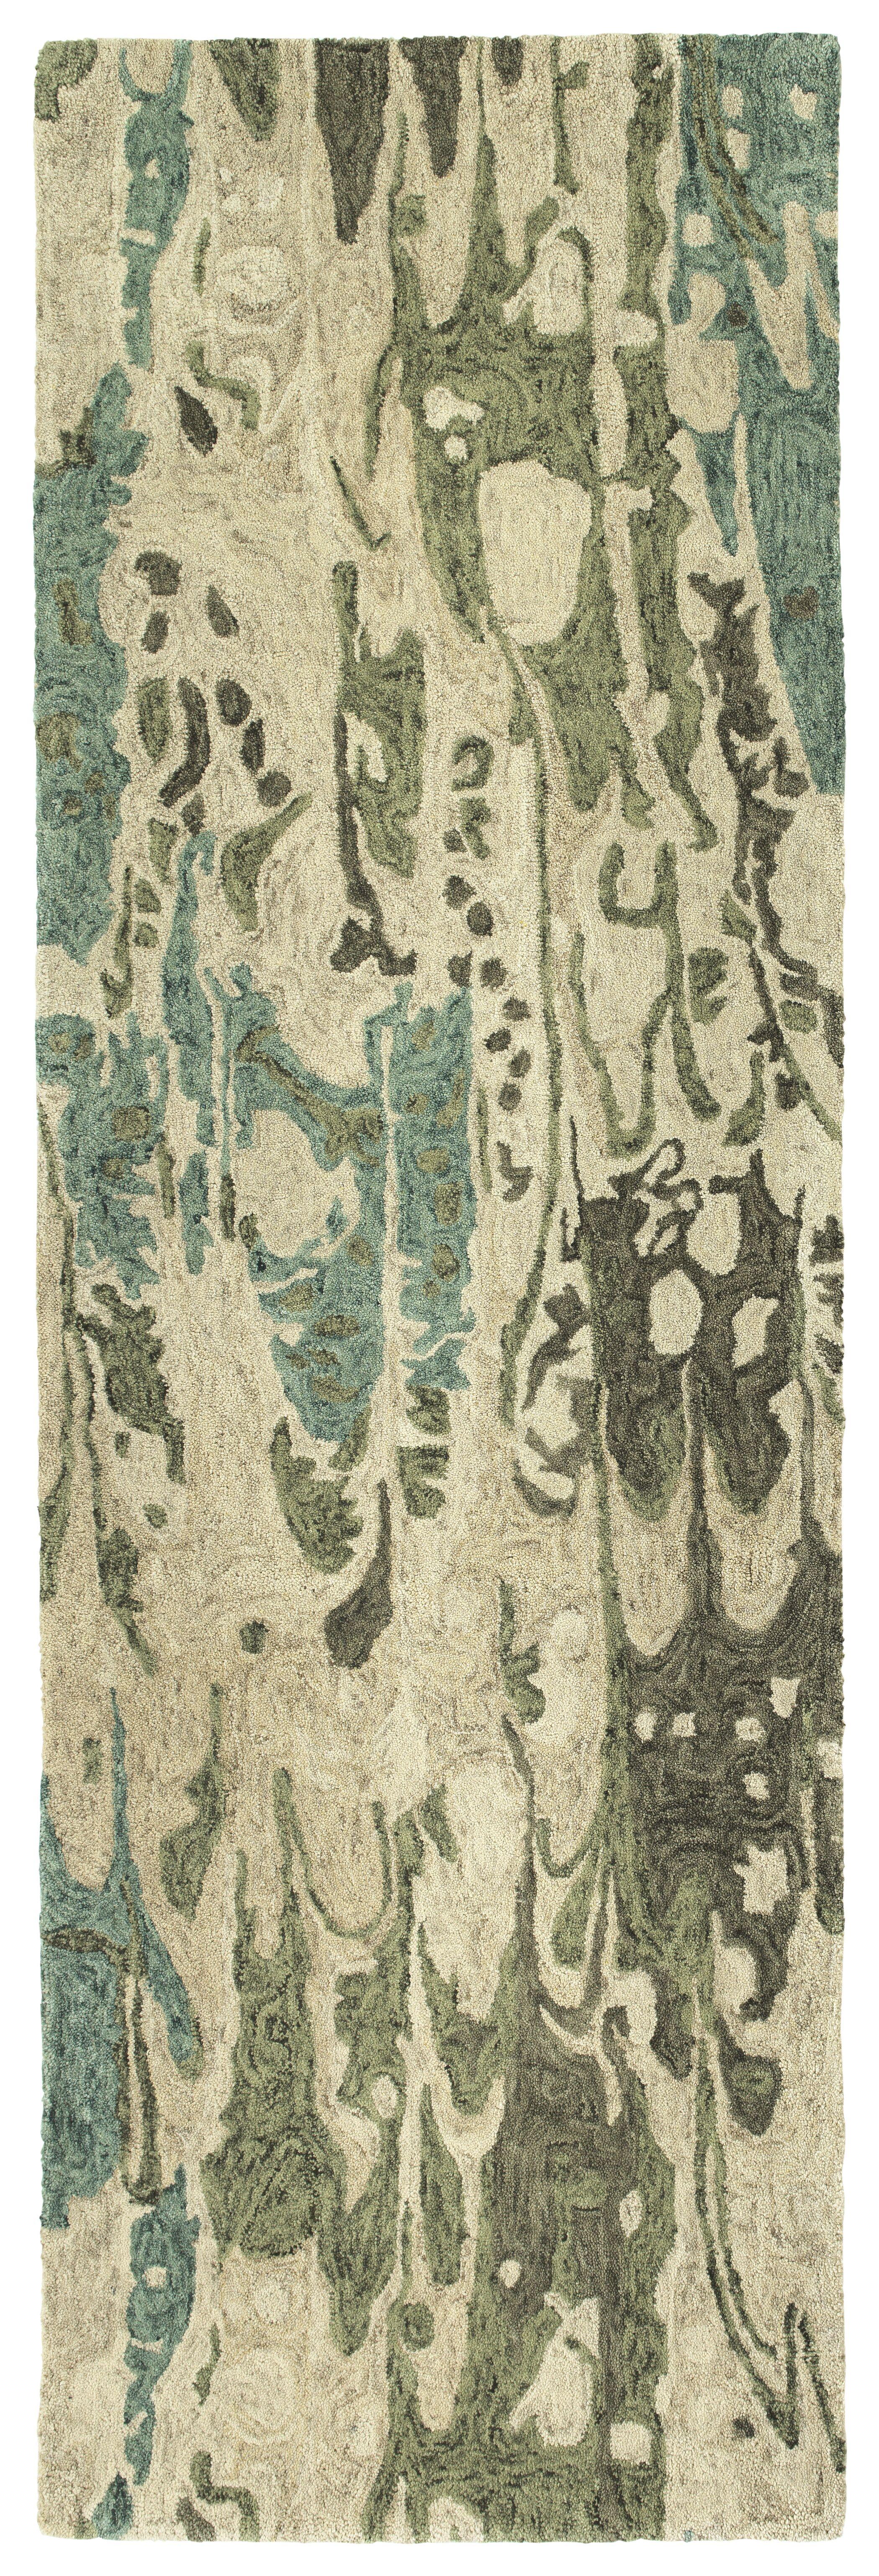 Bargas Hand Tufted Wool Sea Foam/Beige Area Rug Rug Size: Runner 2'6